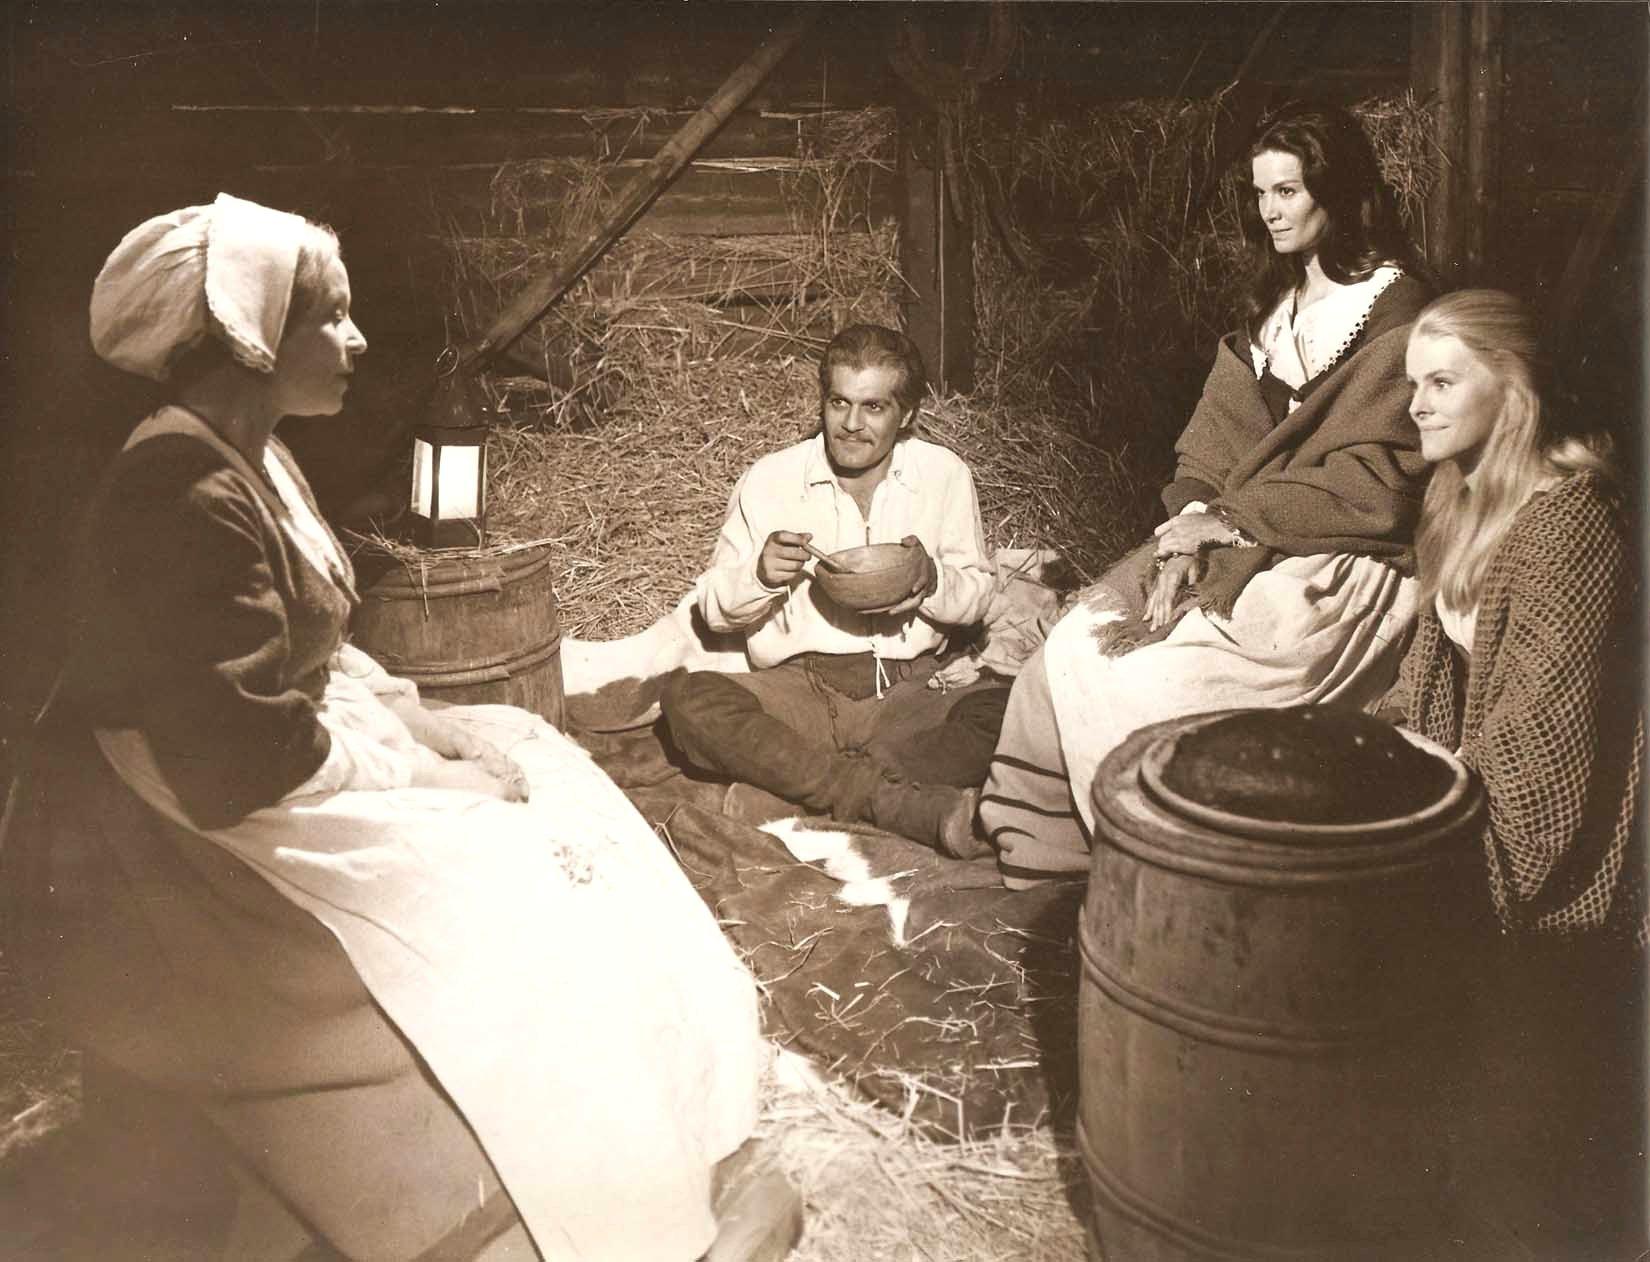 Omar Sharif, Florinda Bolkan, Madeleine Hinde, and Irene Prador in The Last Valley (1971)